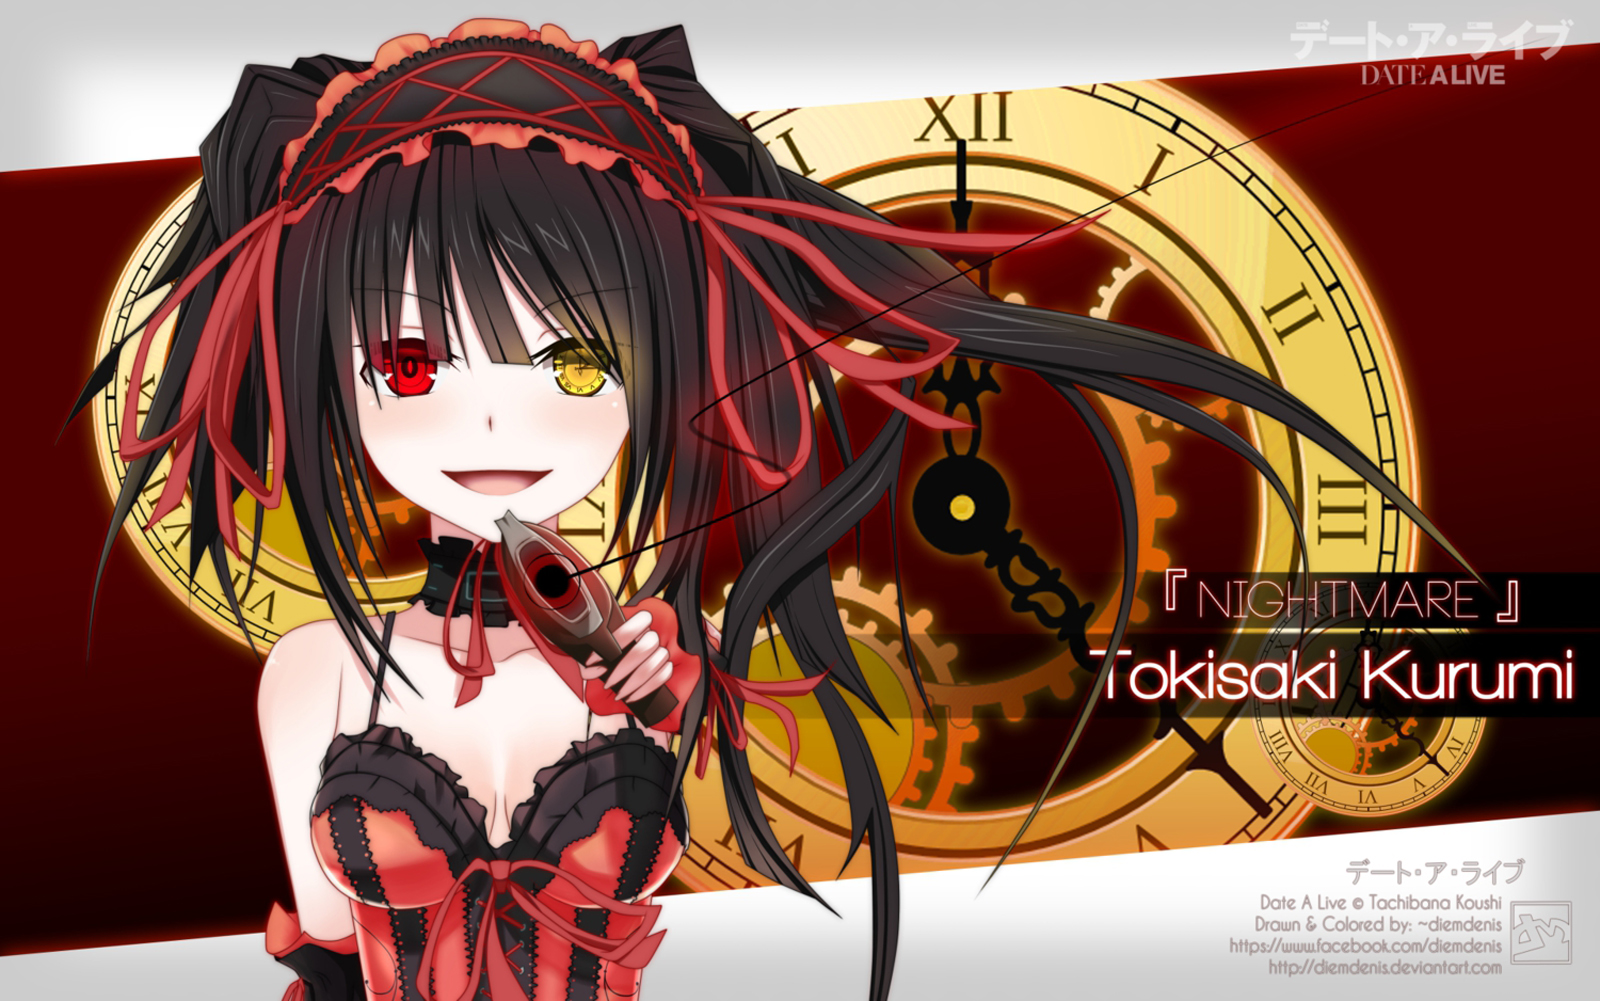 Date A Live Anime Tokisaki Kurumi Anime Girl HD Wallpaper Desktop 1600x1001